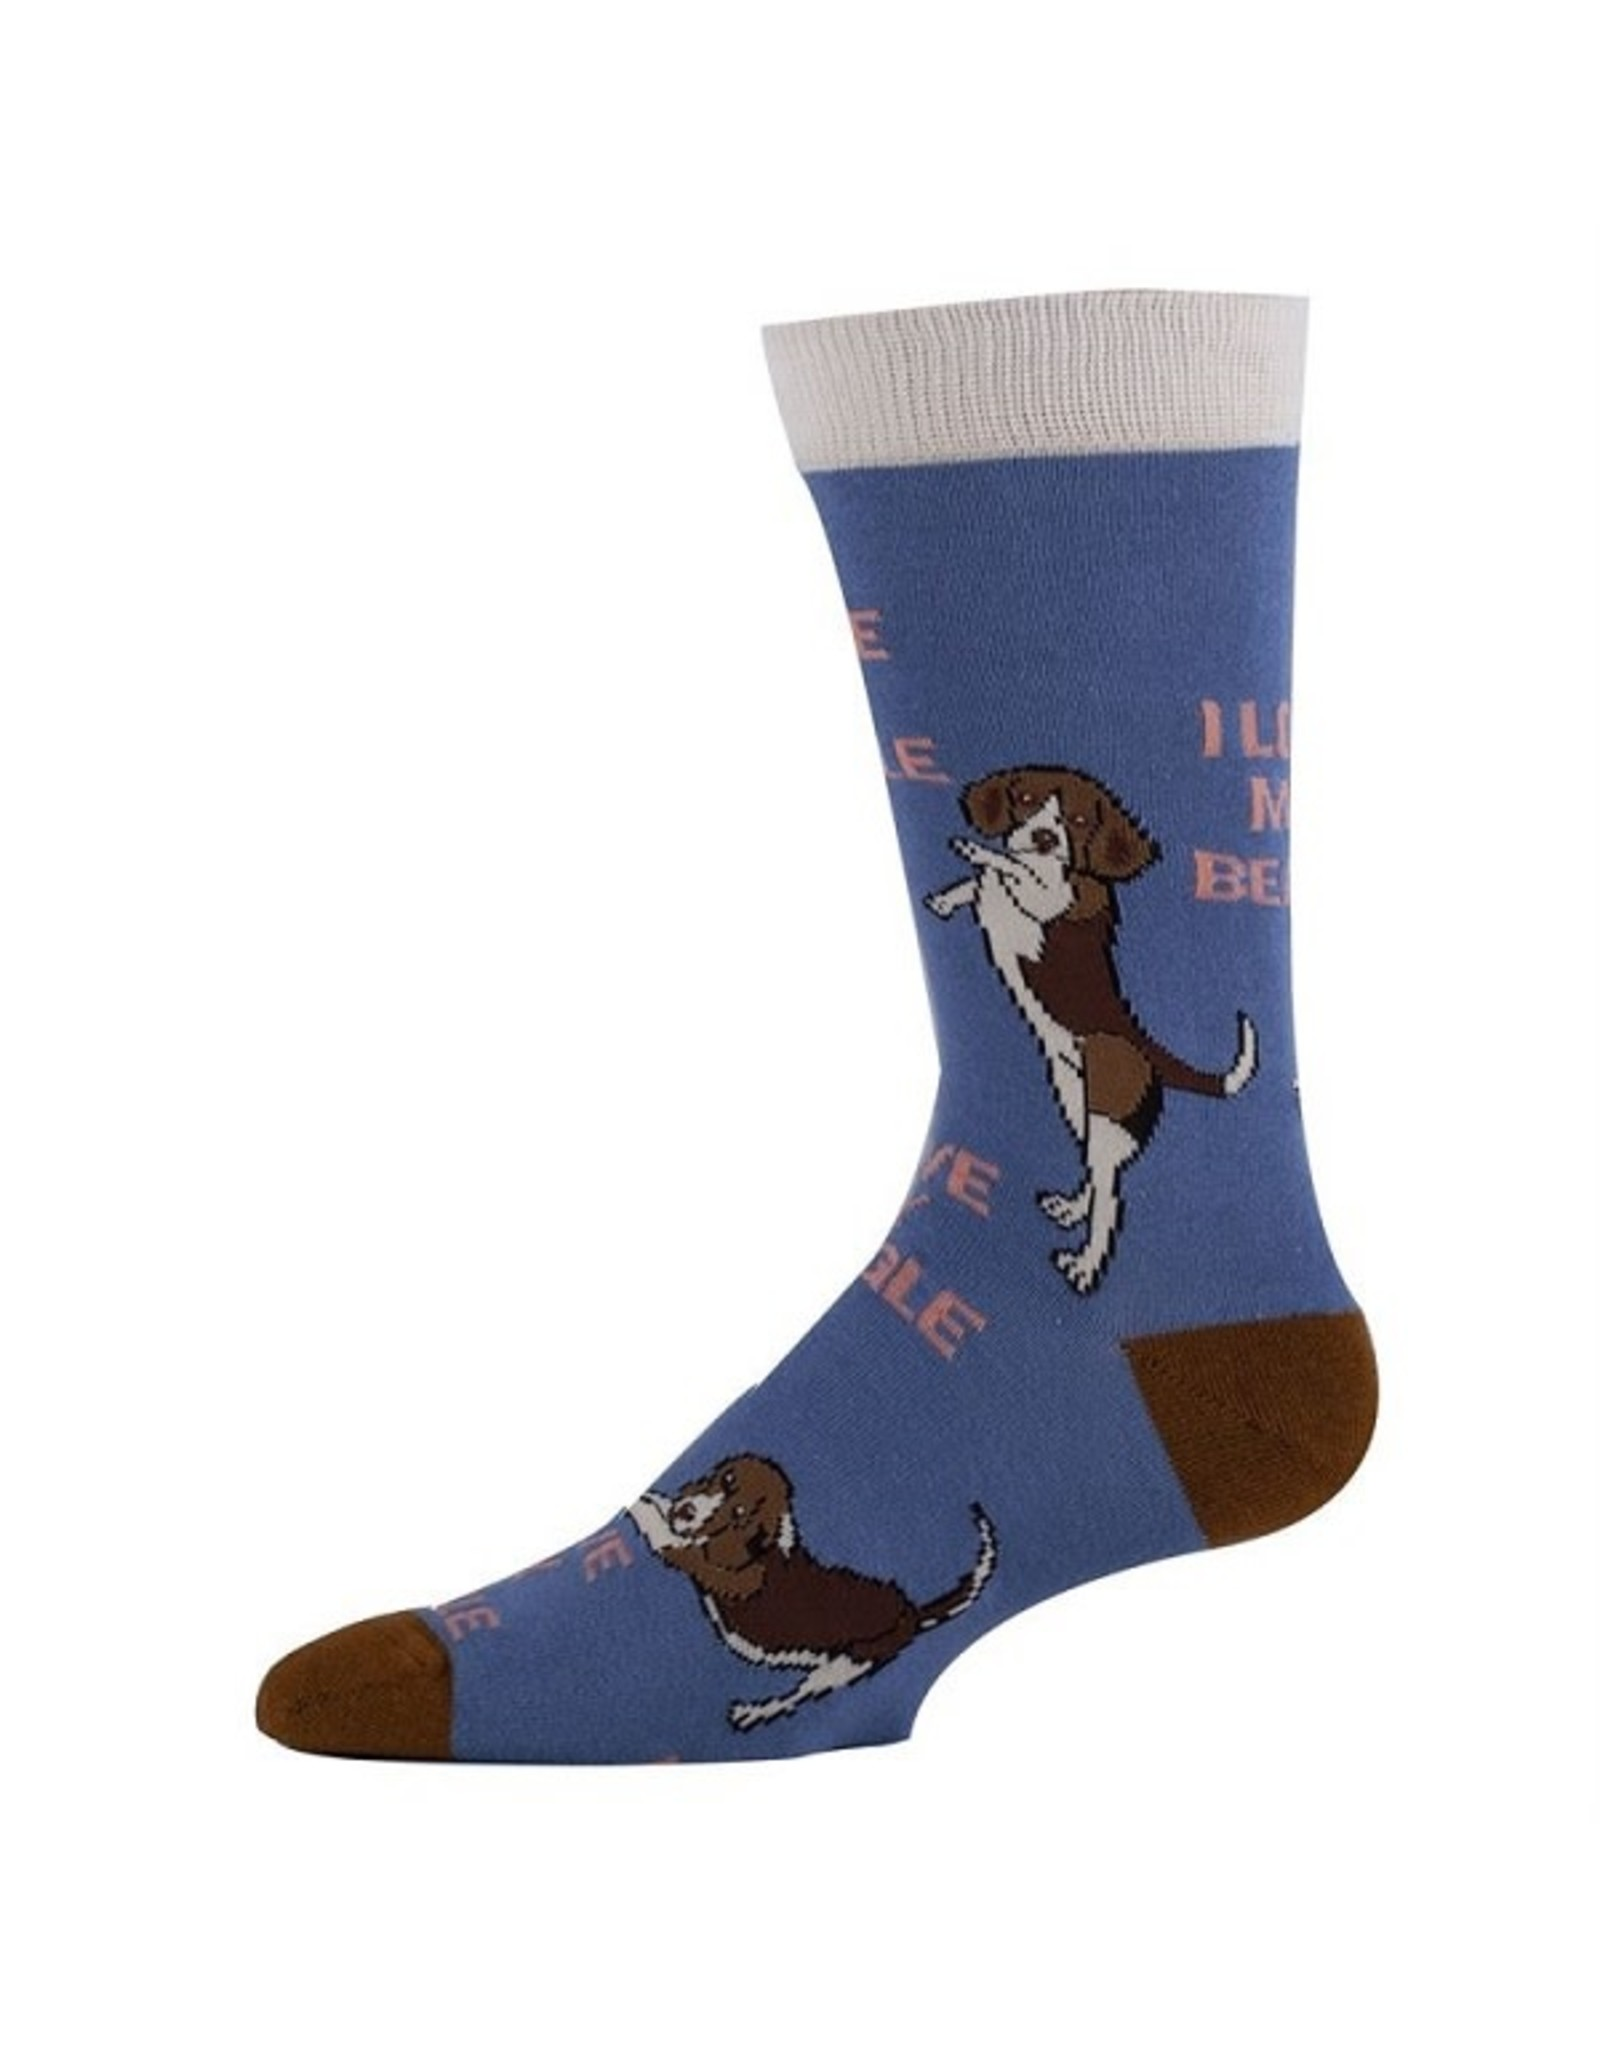 JY Socks BEAGLE TIME SOCKS